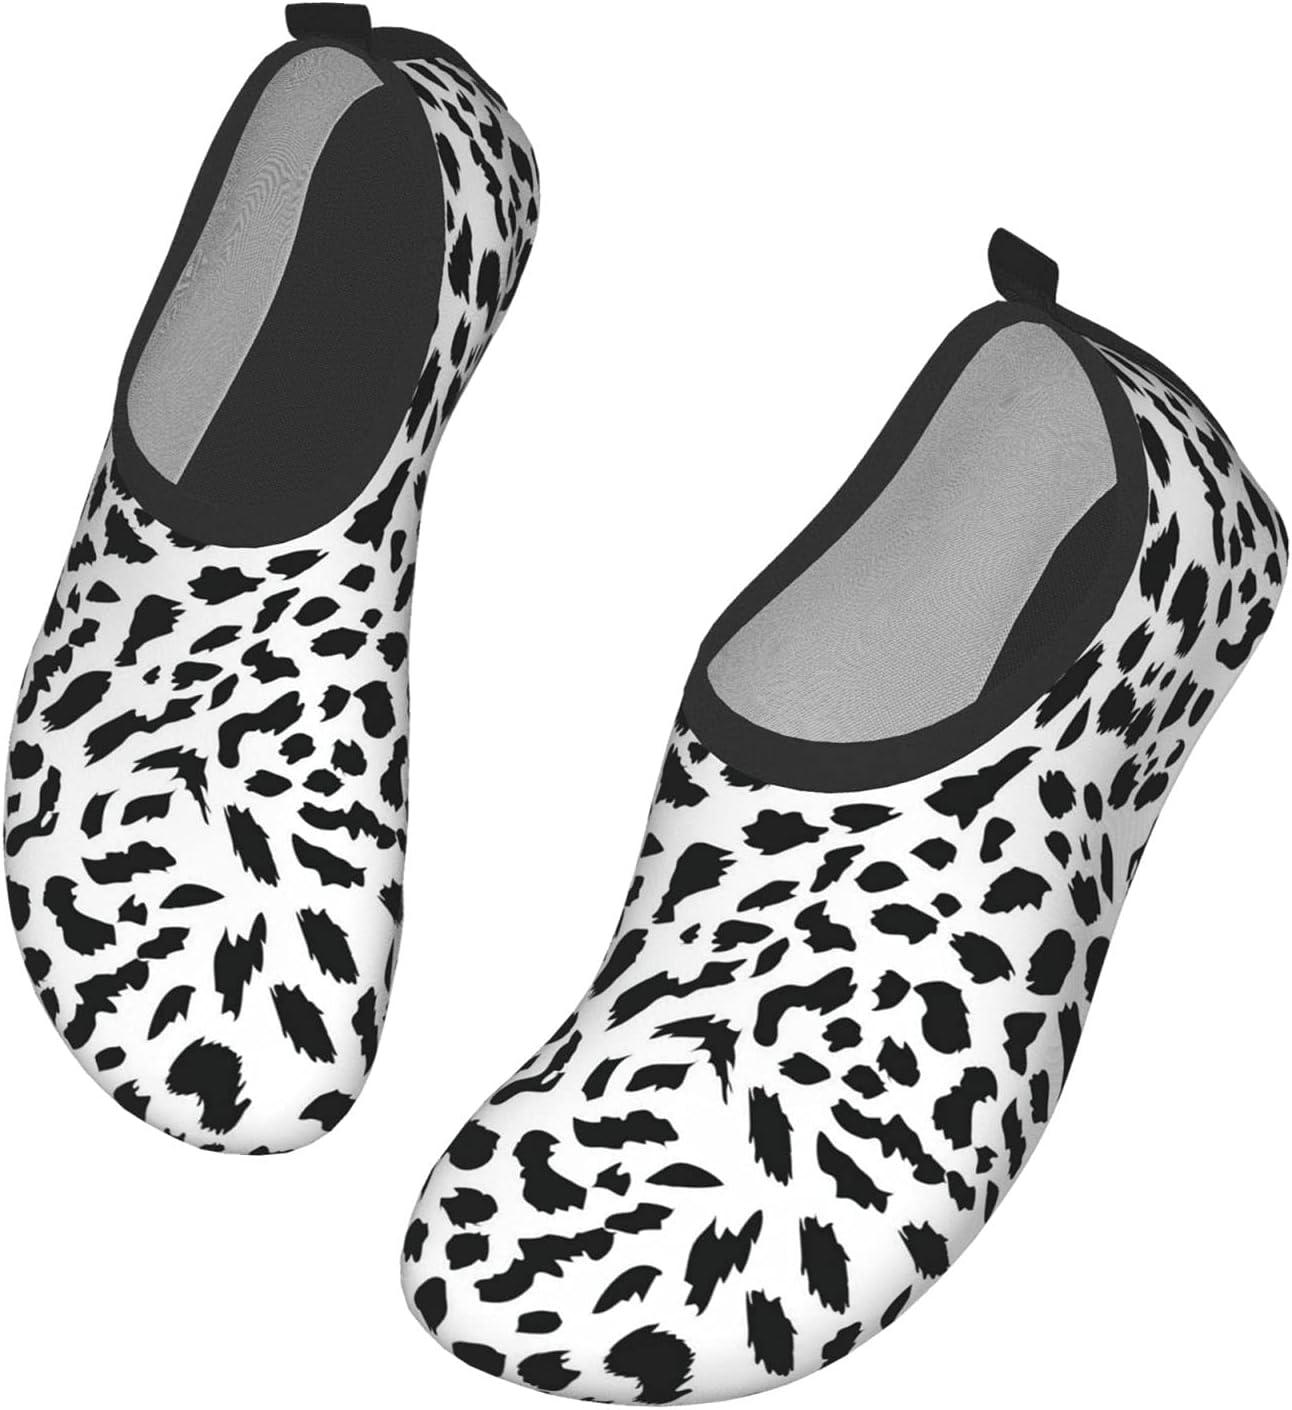 NA Black Leopard Dots On White Men's Women's Water Shoes Barefoot Quick Dry Slip-On Aqua Socks for Yoga Beach Sports Swim Surf